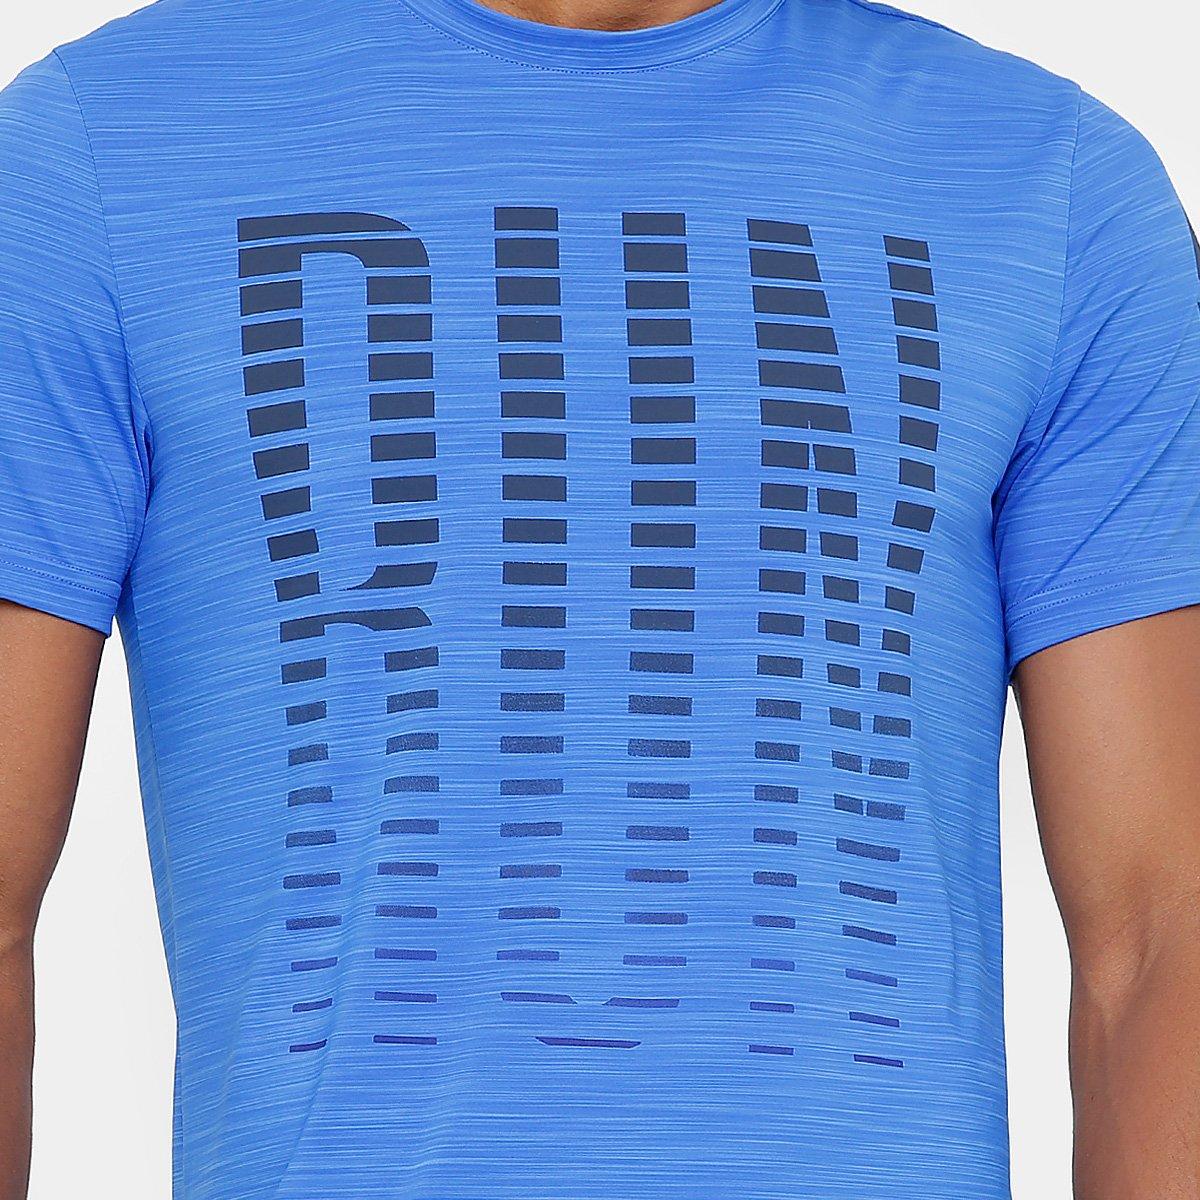 b4f29185b7 ... Camiseta Reebok Activchill Osr Masculina - Azul - Compre Agora ...  afb6f131d80f9a ...